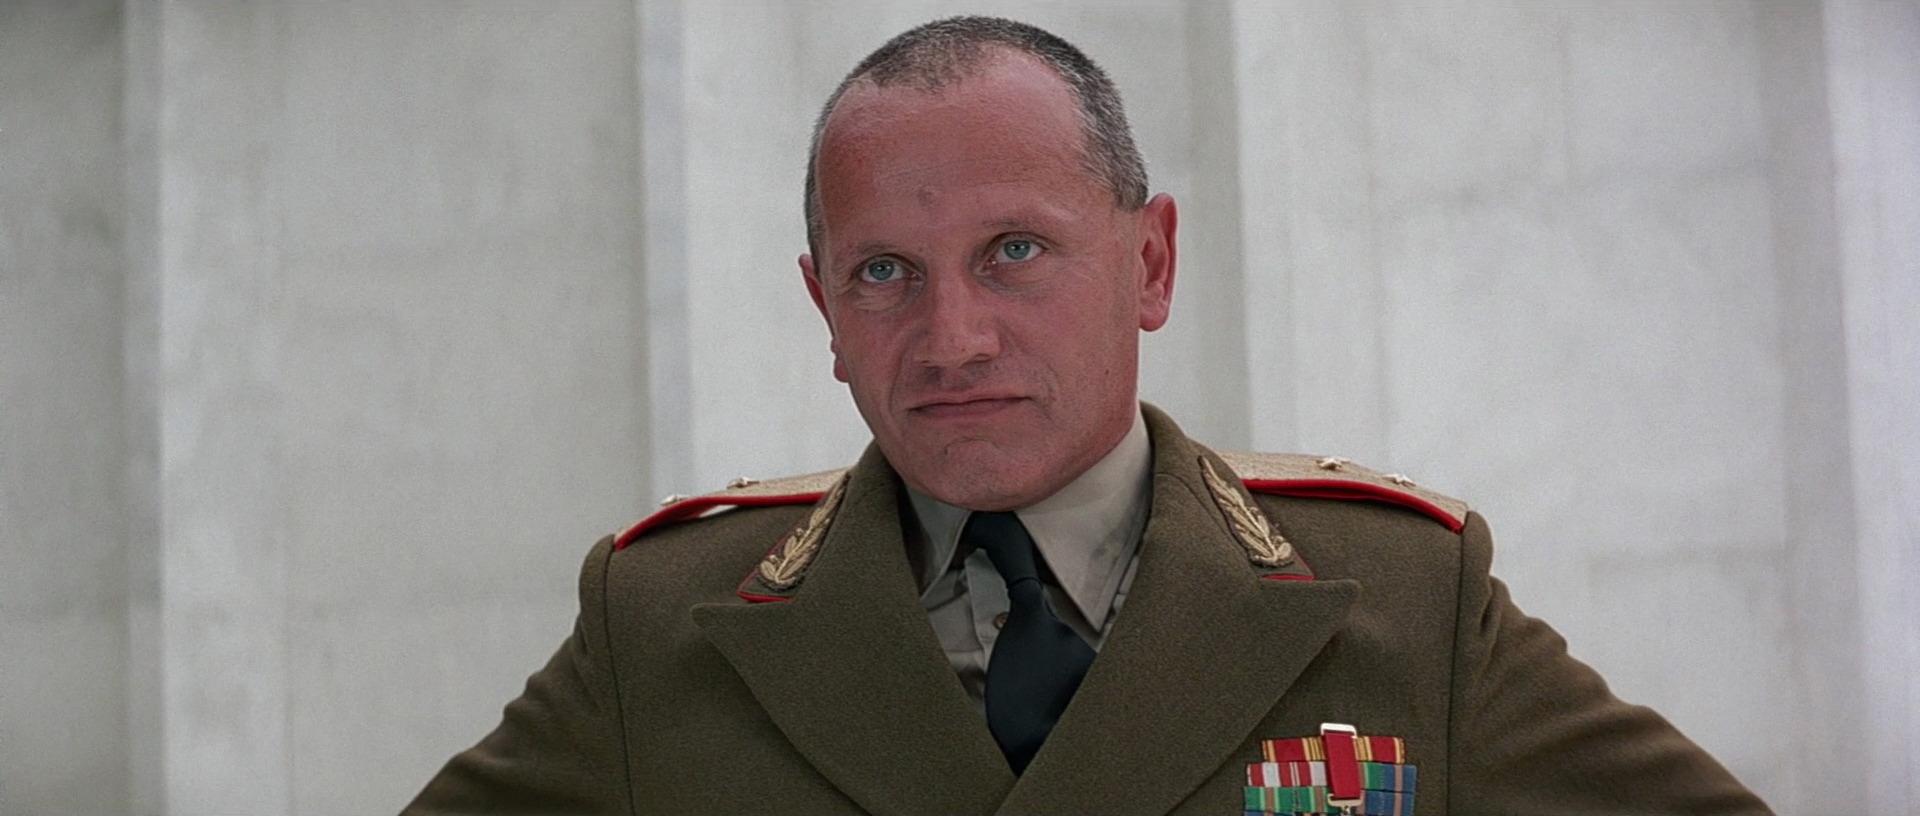 File:General Orlov (Steven Berkoff) - Profile.jpg